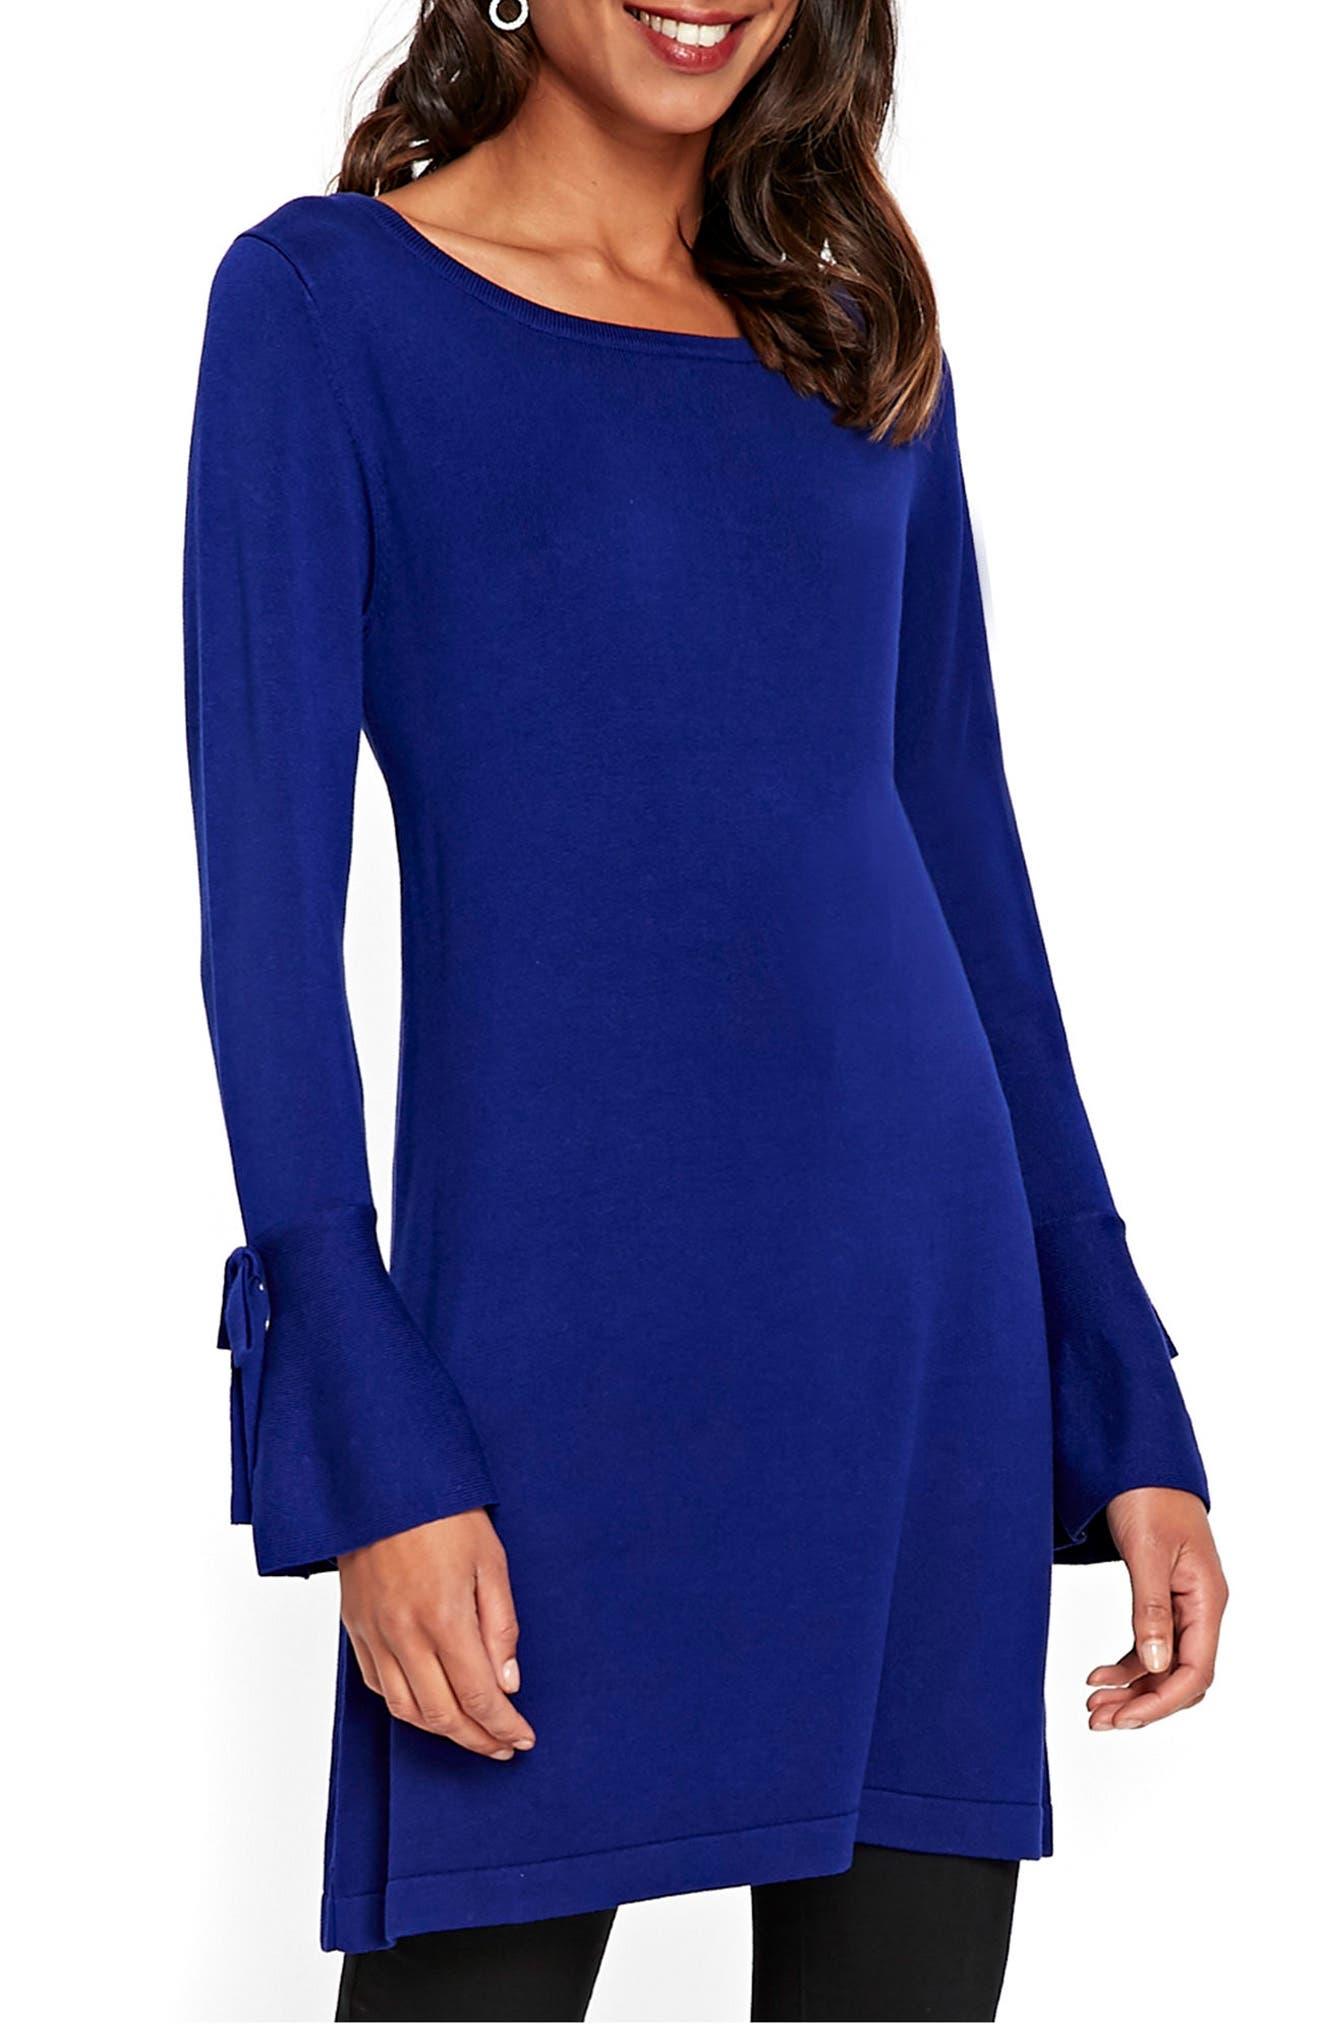 Main Image - Wallis Knitted Bow Sleeve Shift Dress